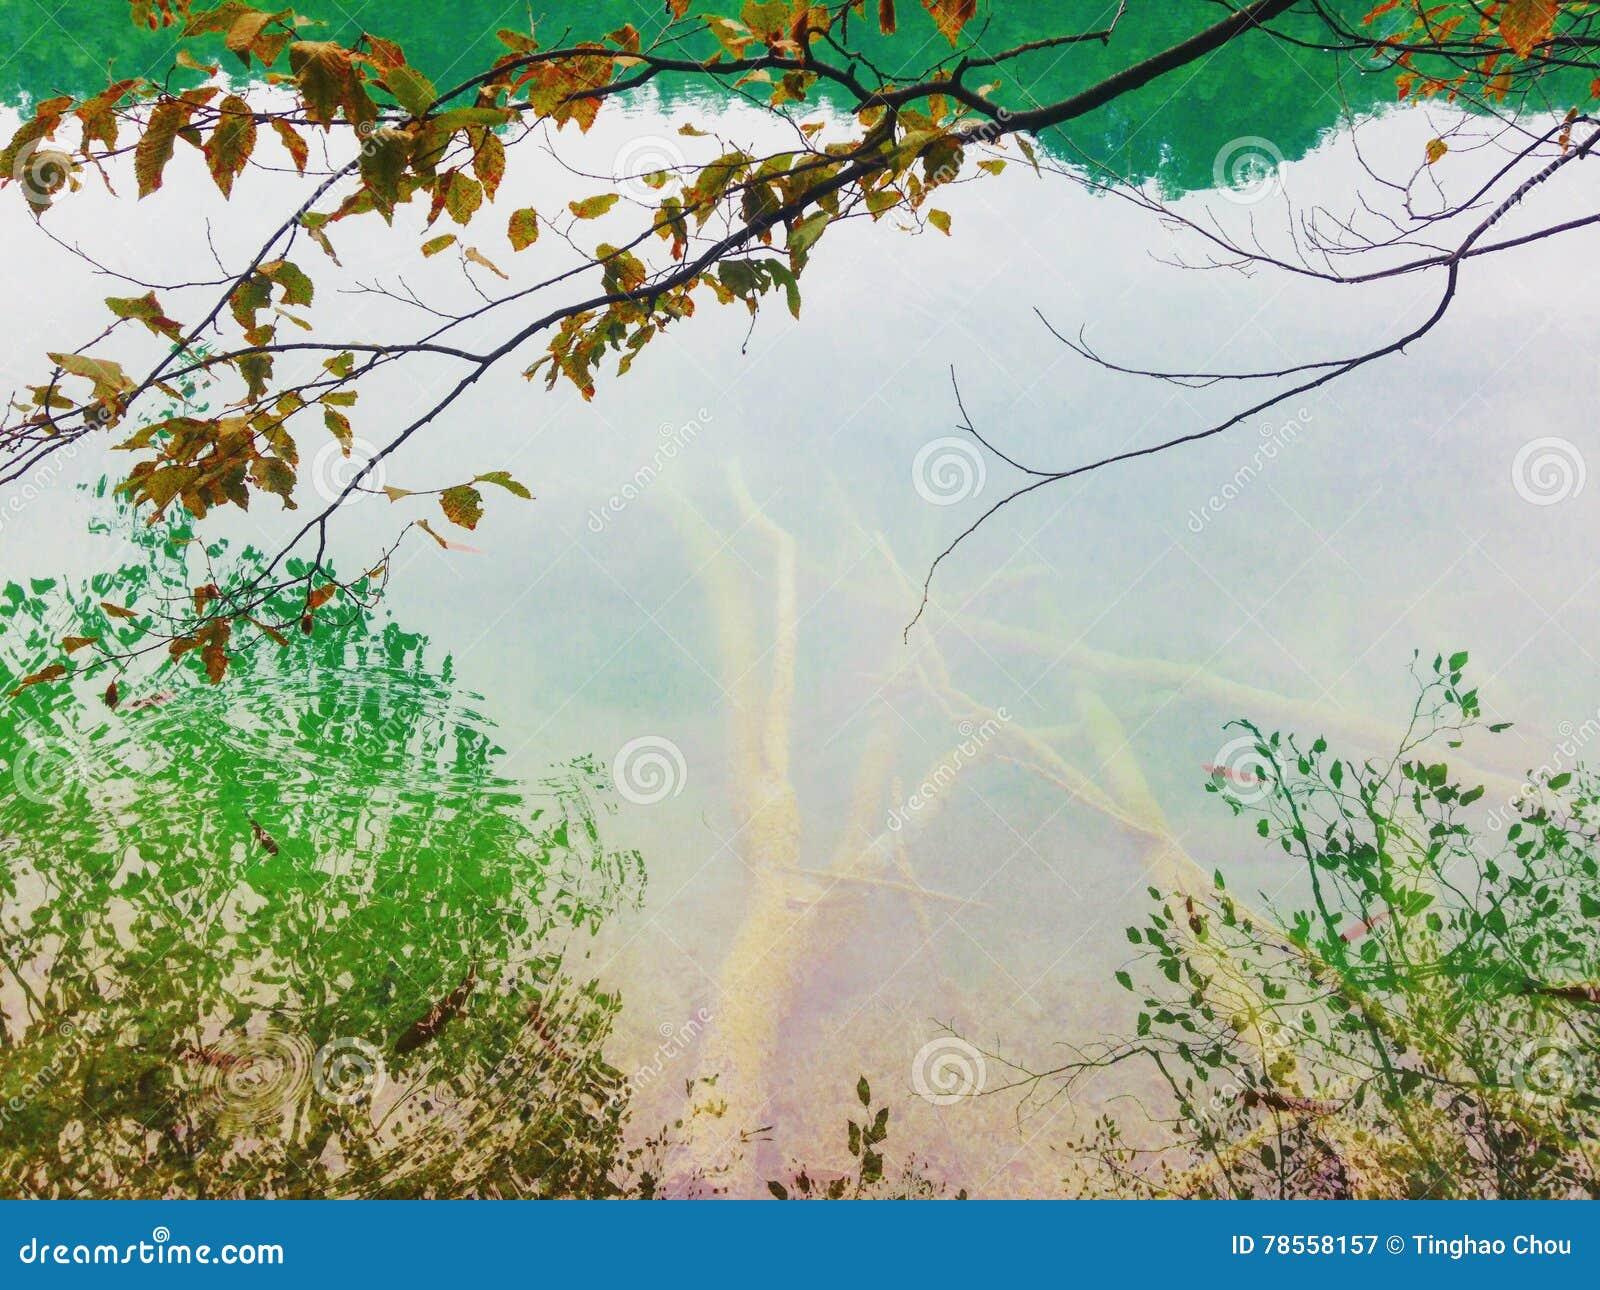 Breathtaking scene of Plitvice lake,national park of Croatia. Listed on UNESCO world heritage.